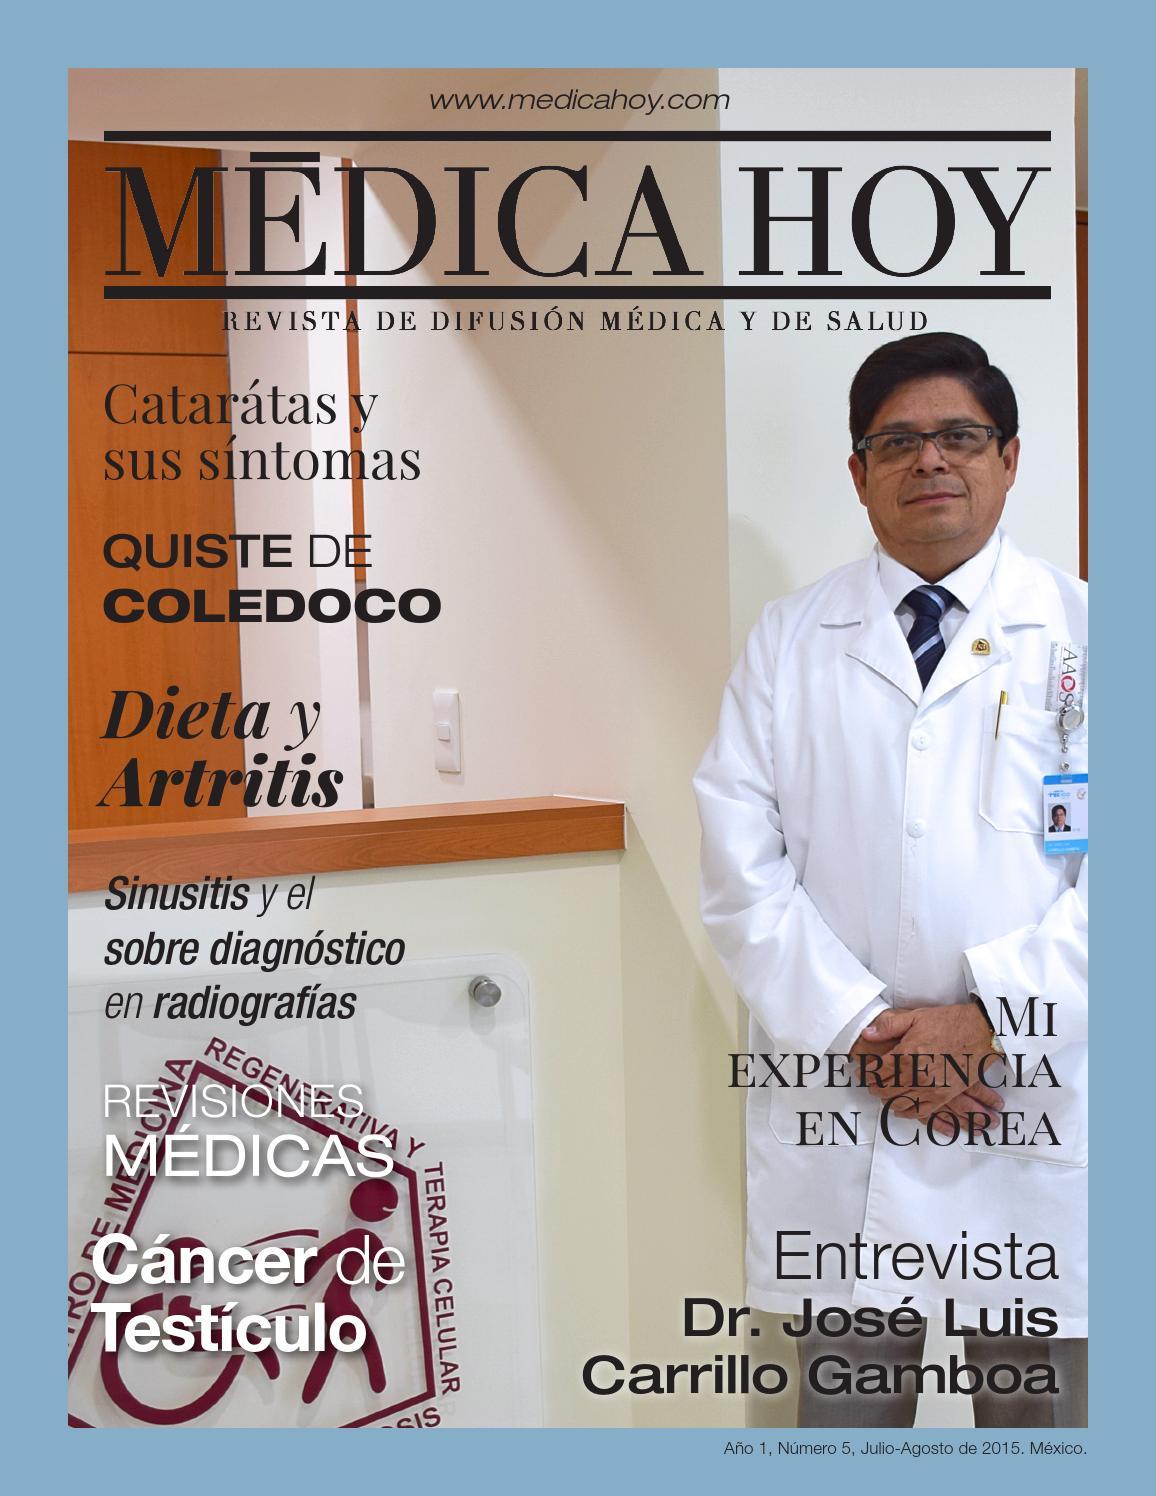 5ta edicion by Médica Hoy - issuu